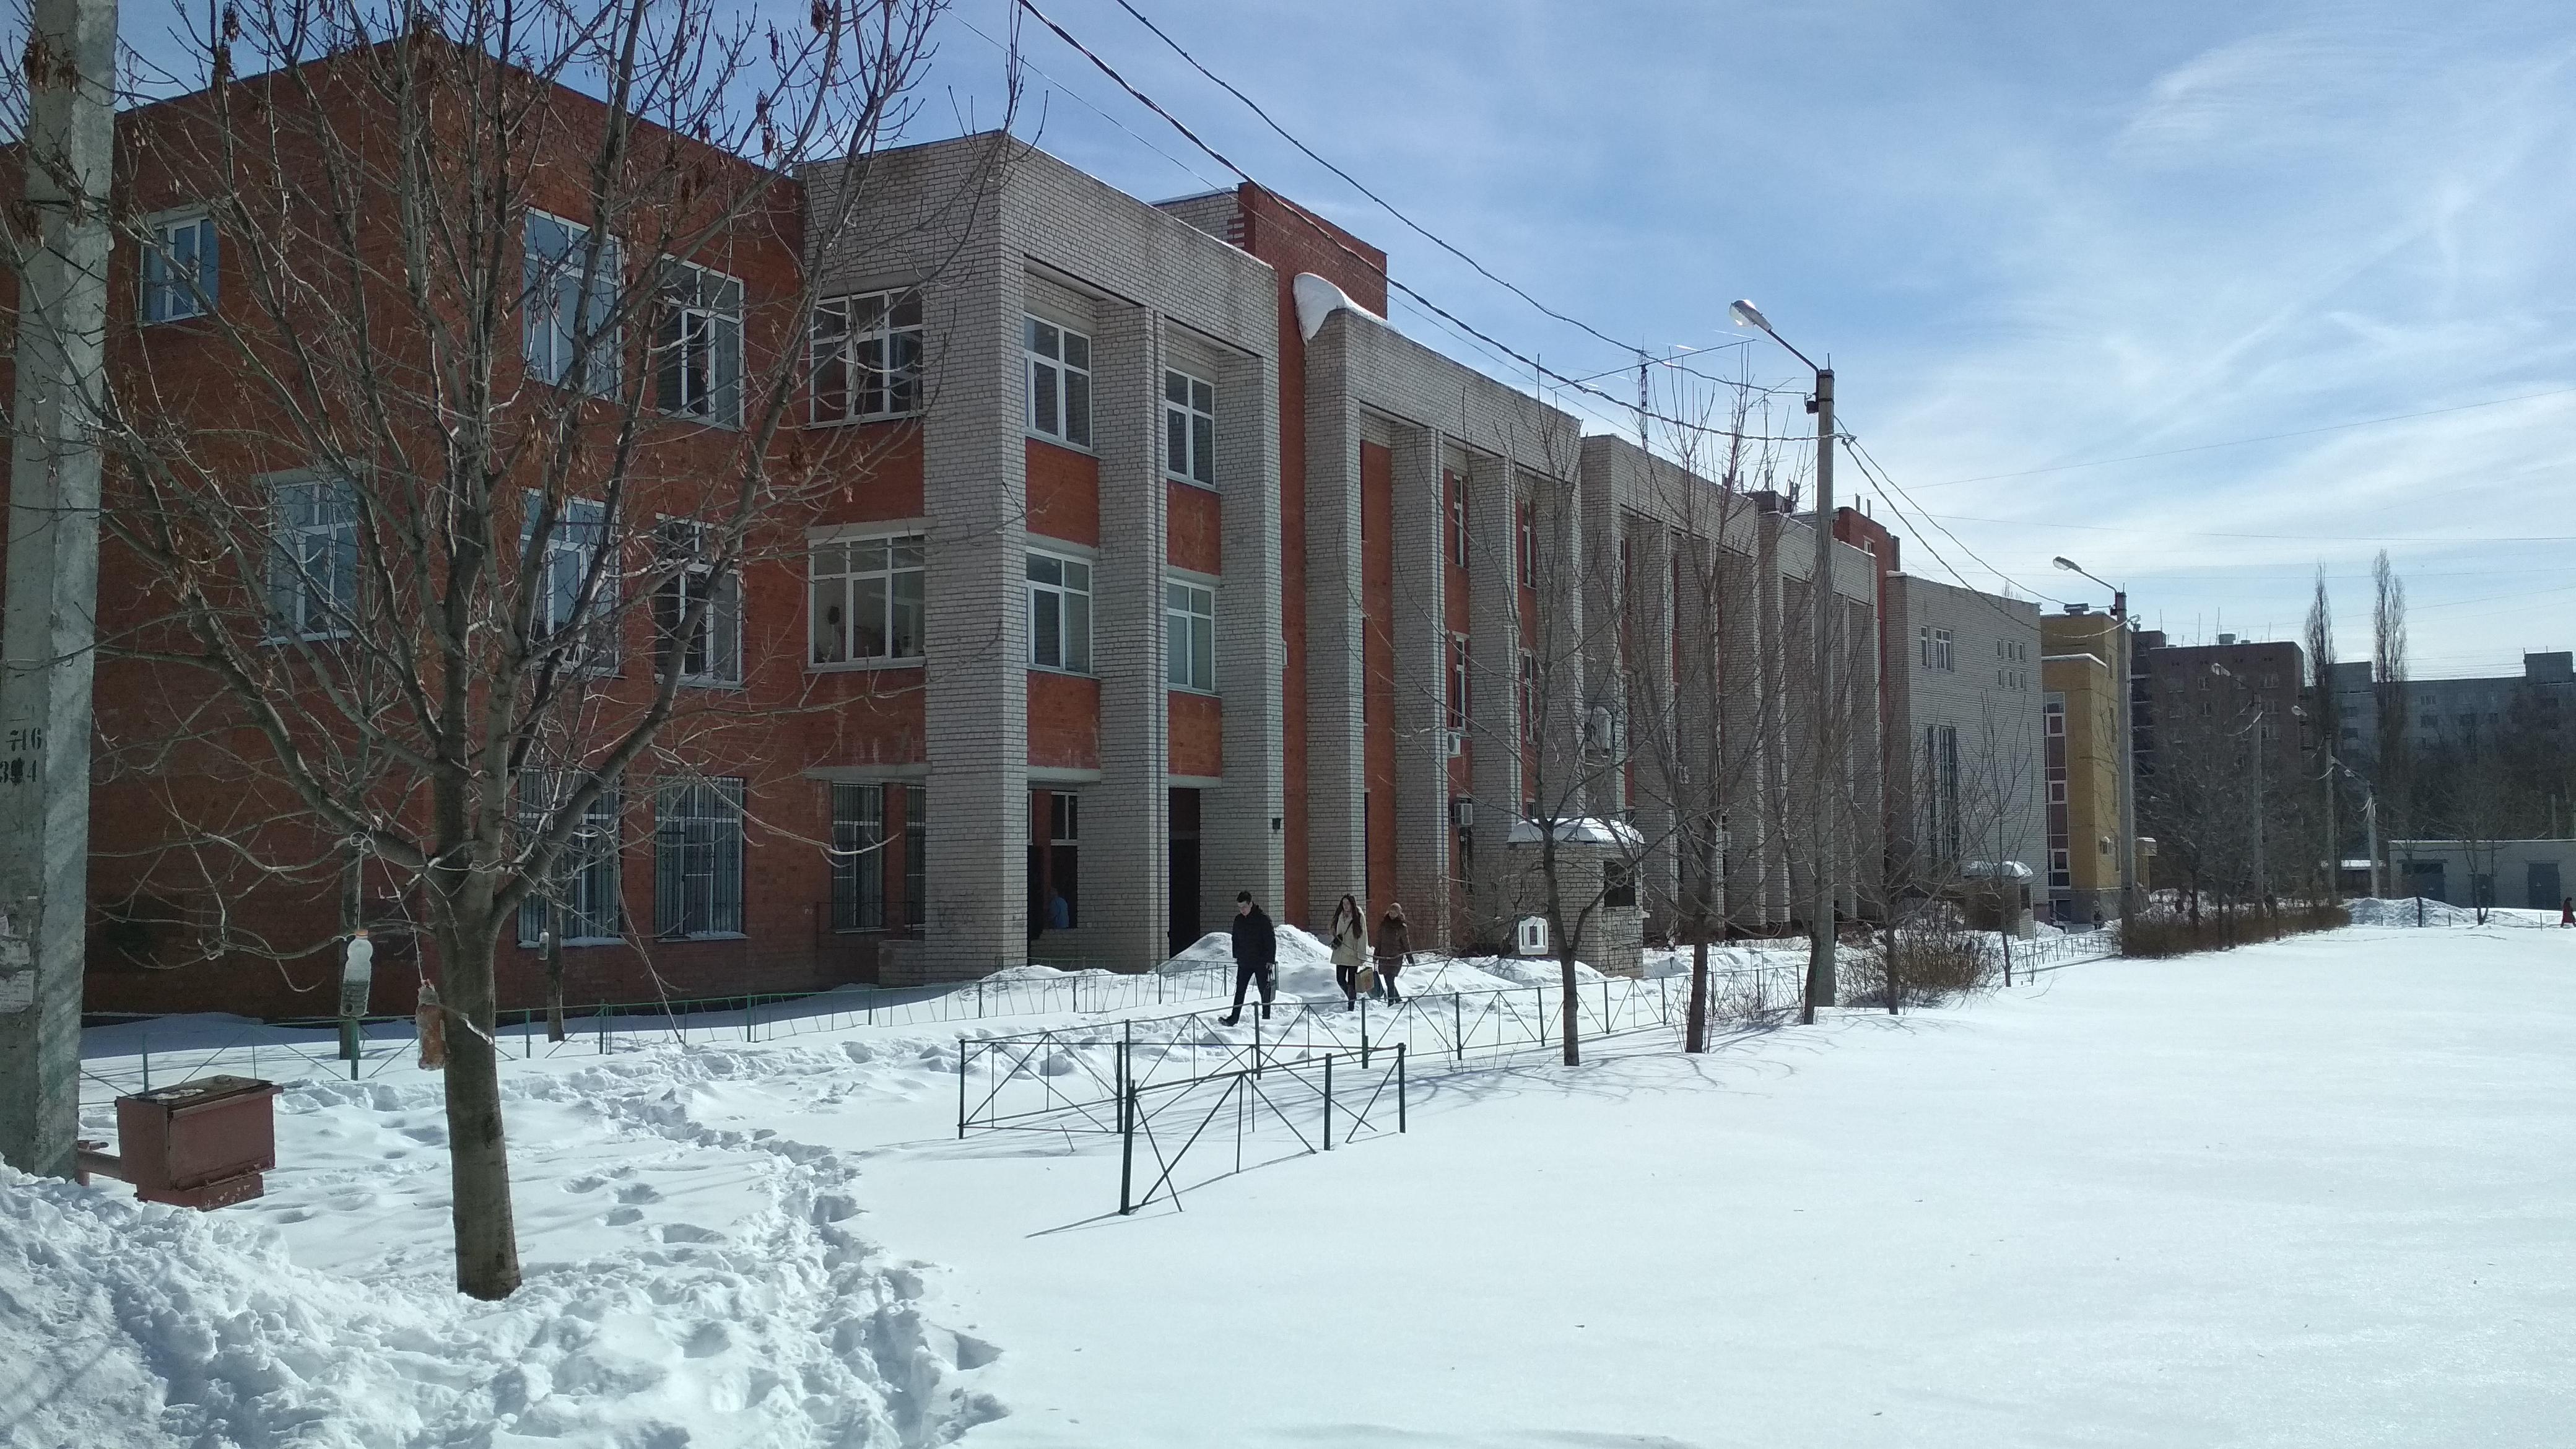 33/5000 The building of the VSU in Russia.